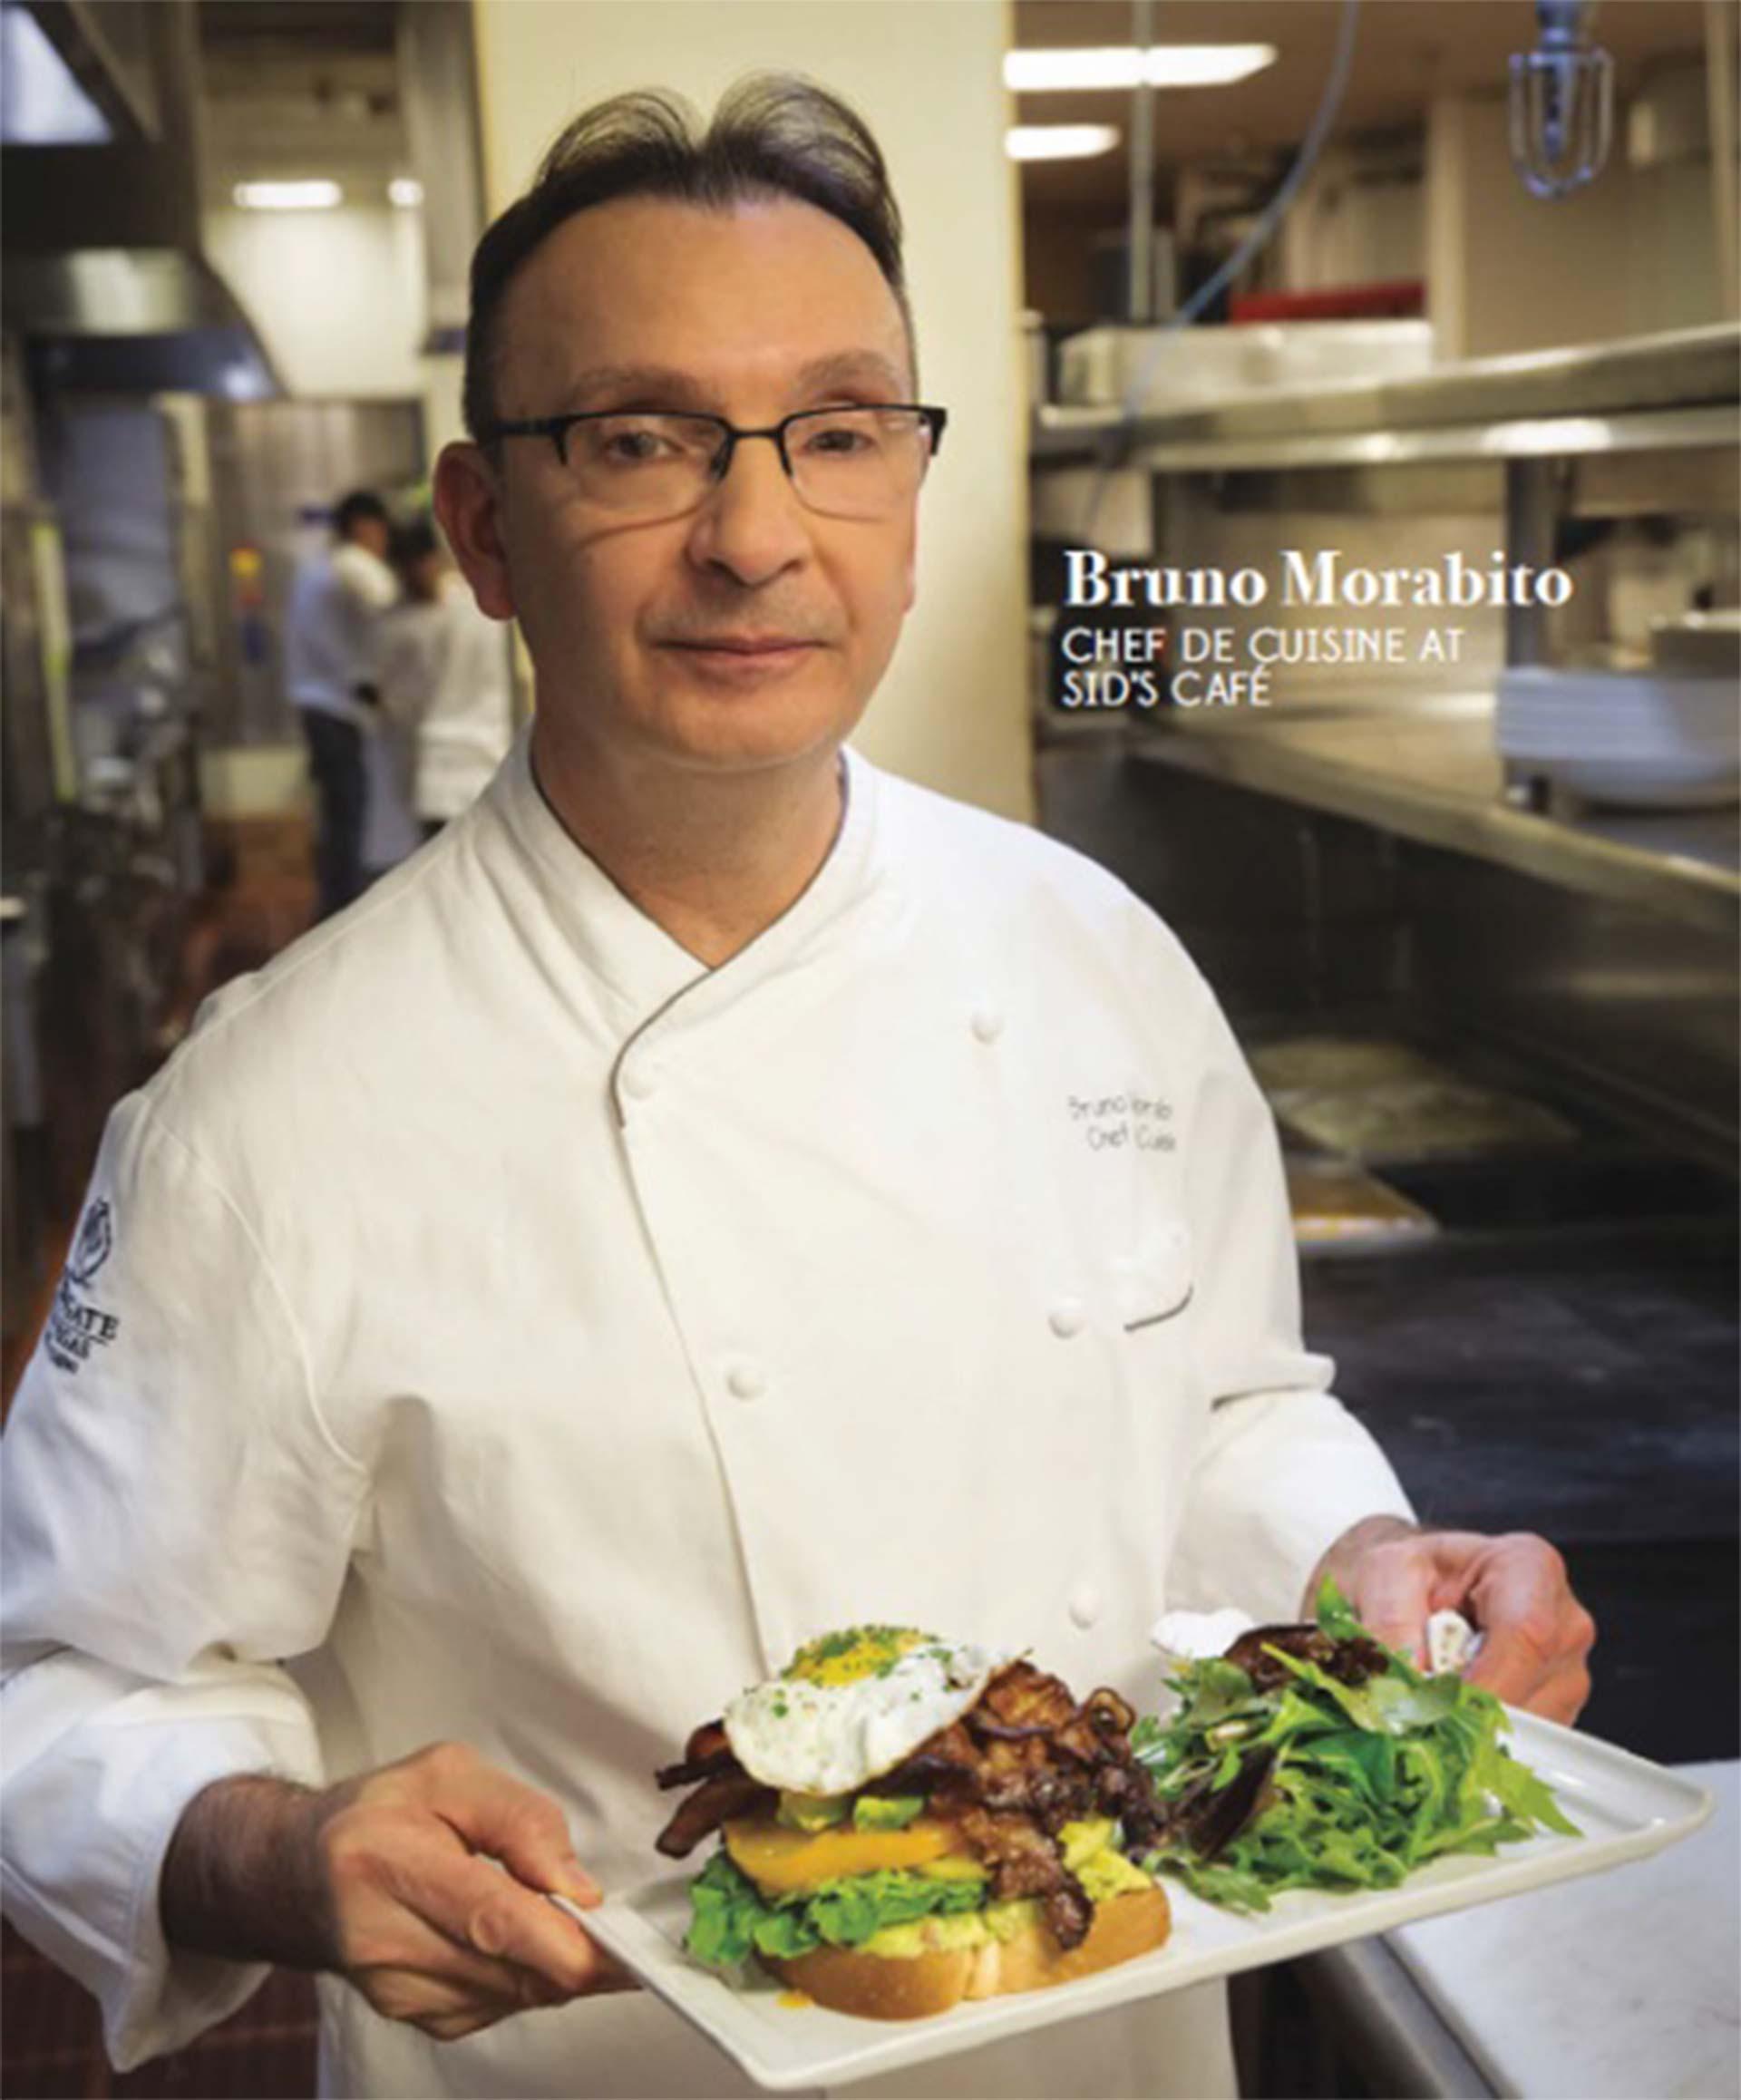 Westgate Celebrity Chefs Las Vegas: Bruno Morabito | Westgate Las Vegas Resort & Casino